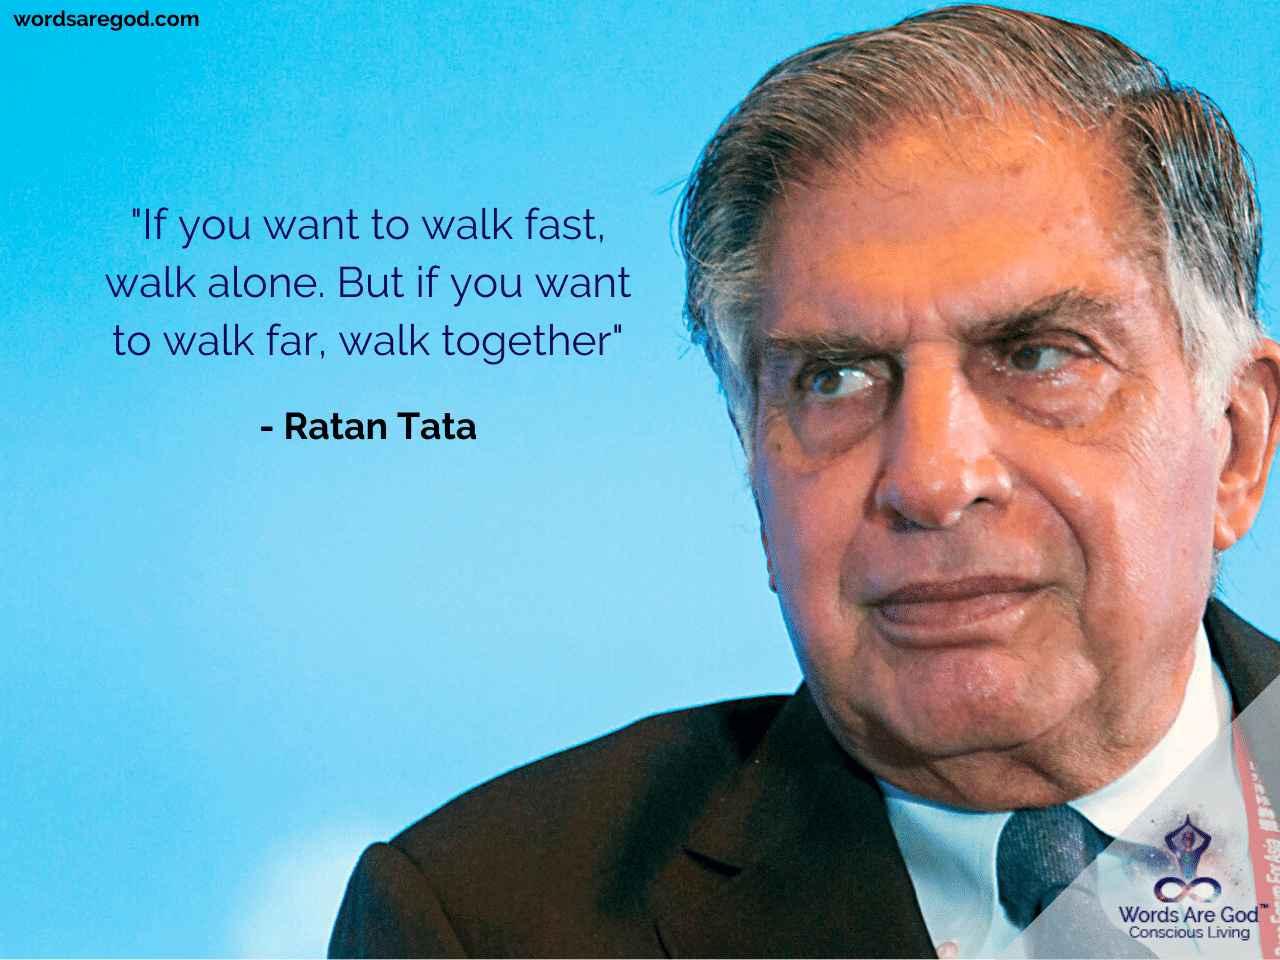 Ratan Tata Inspirational Quote